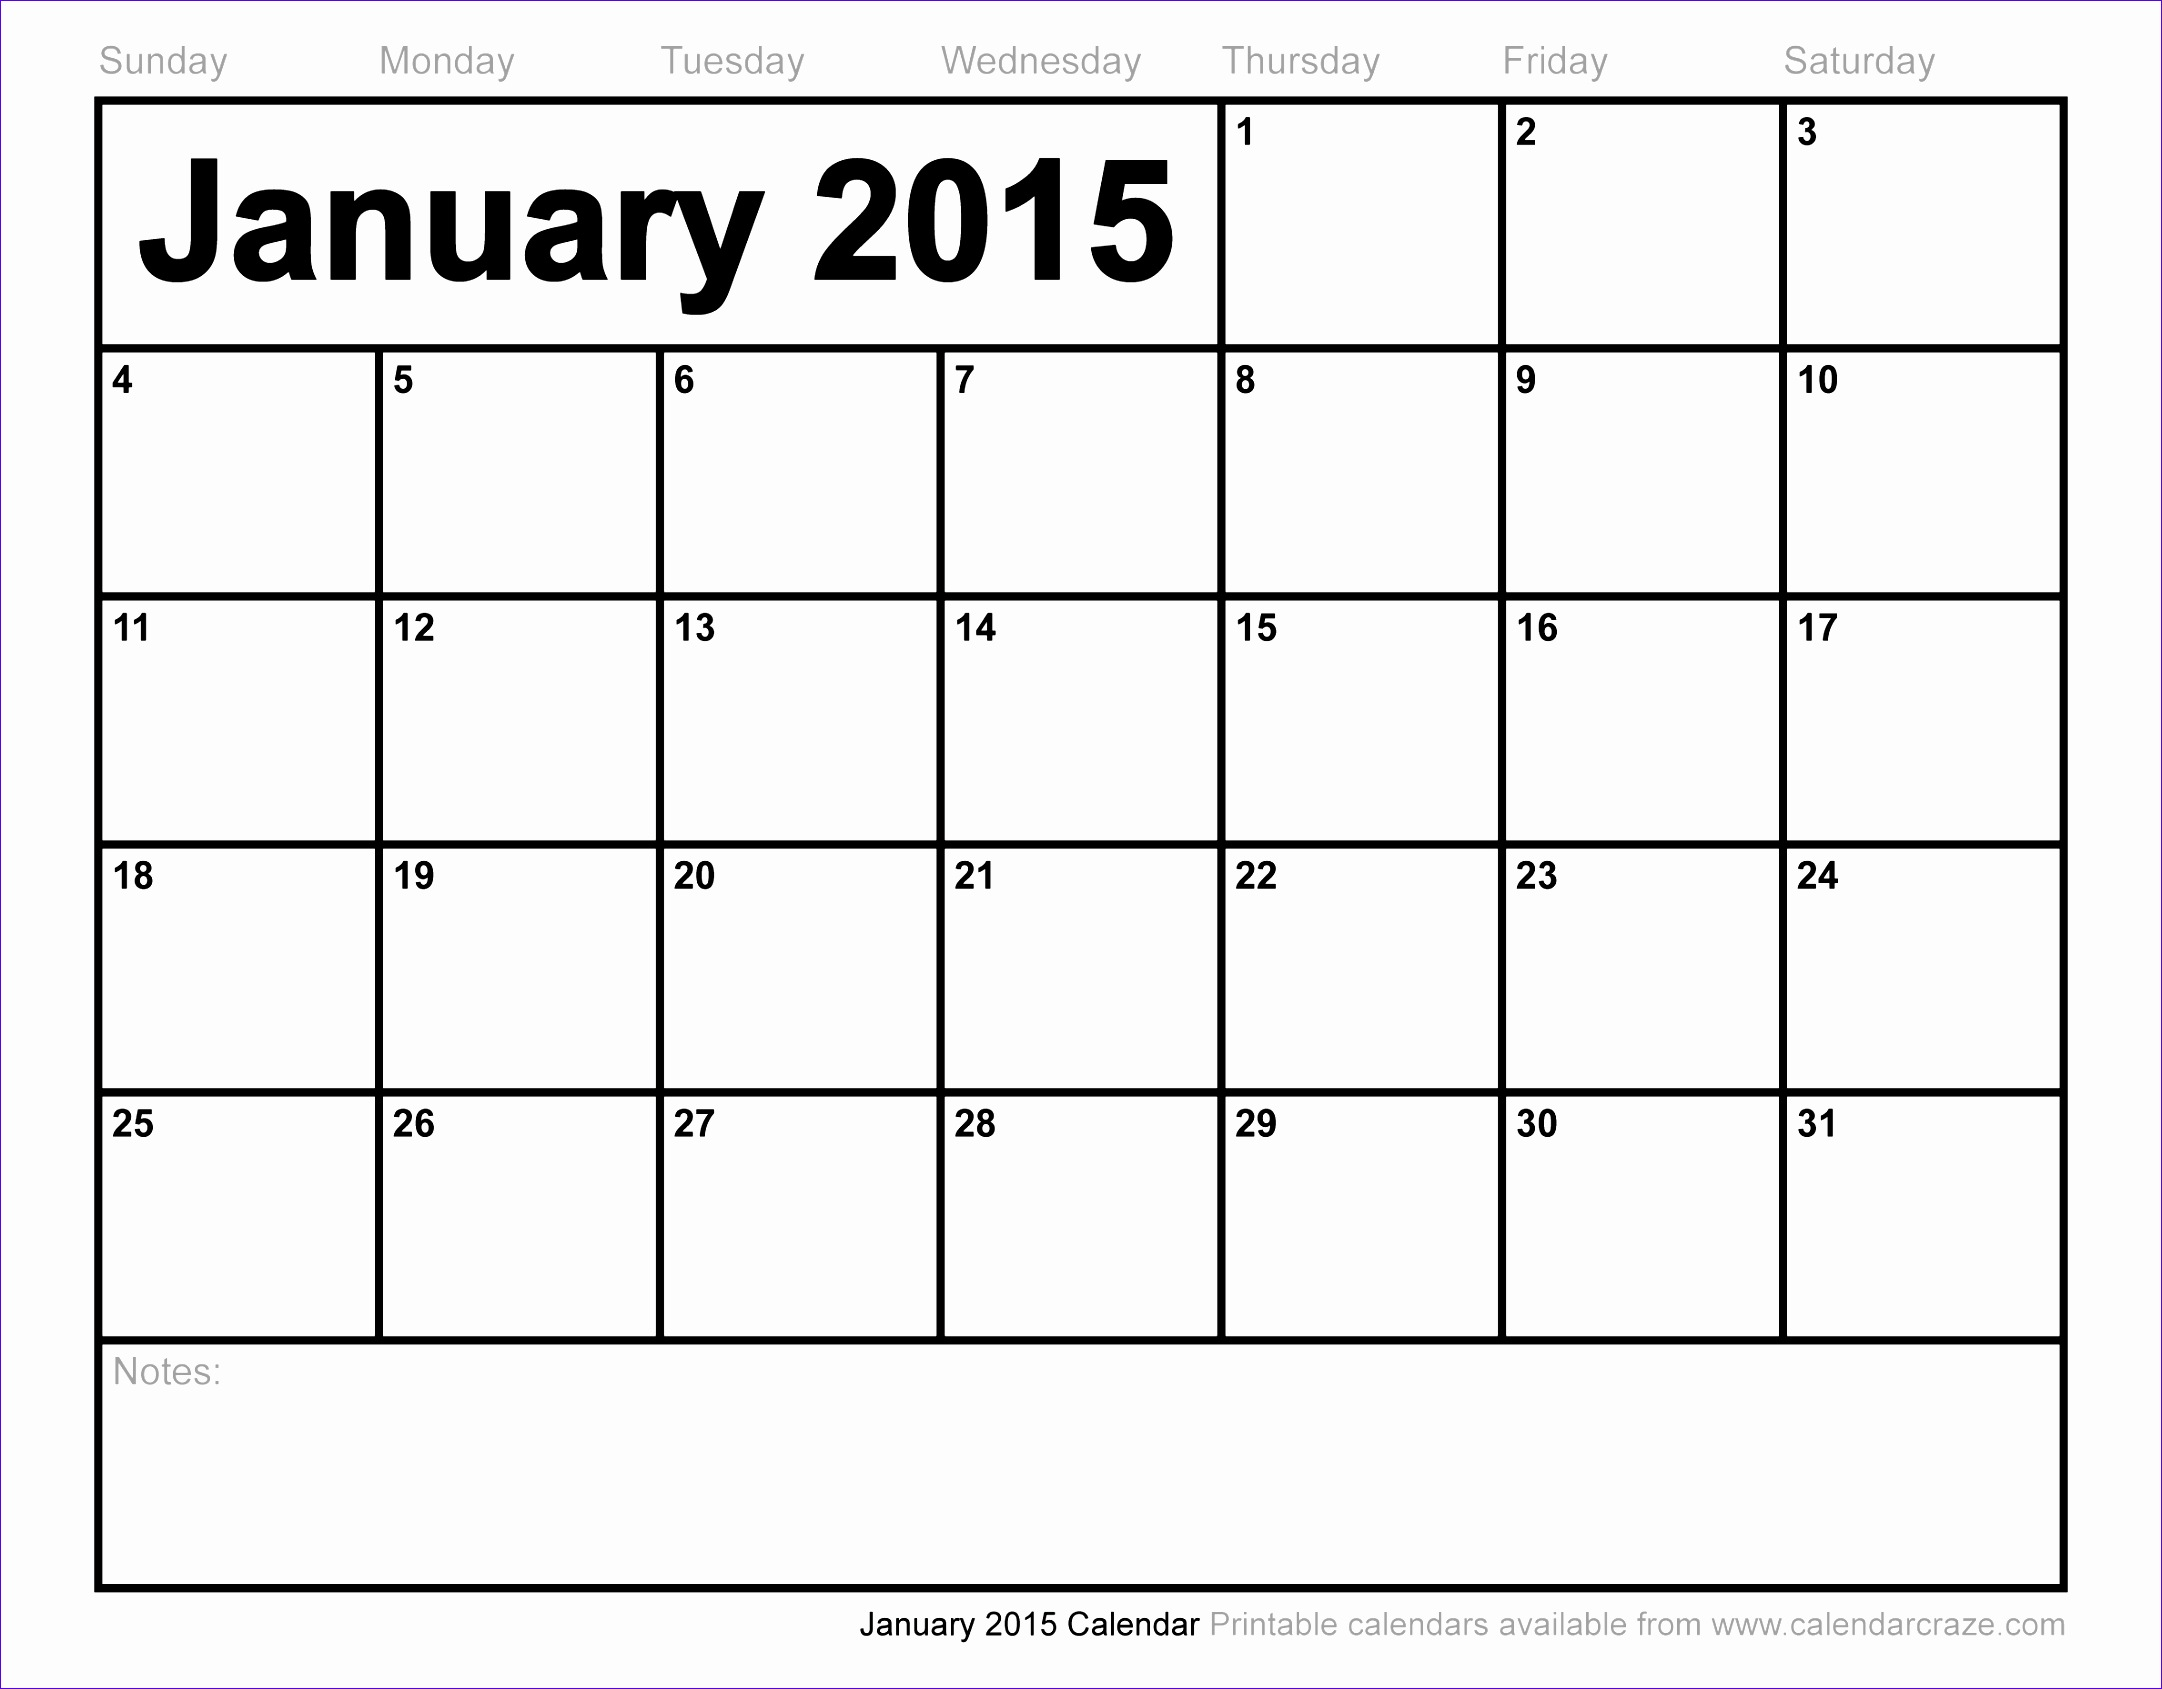 6 2014 excel calendar template exceltemplates